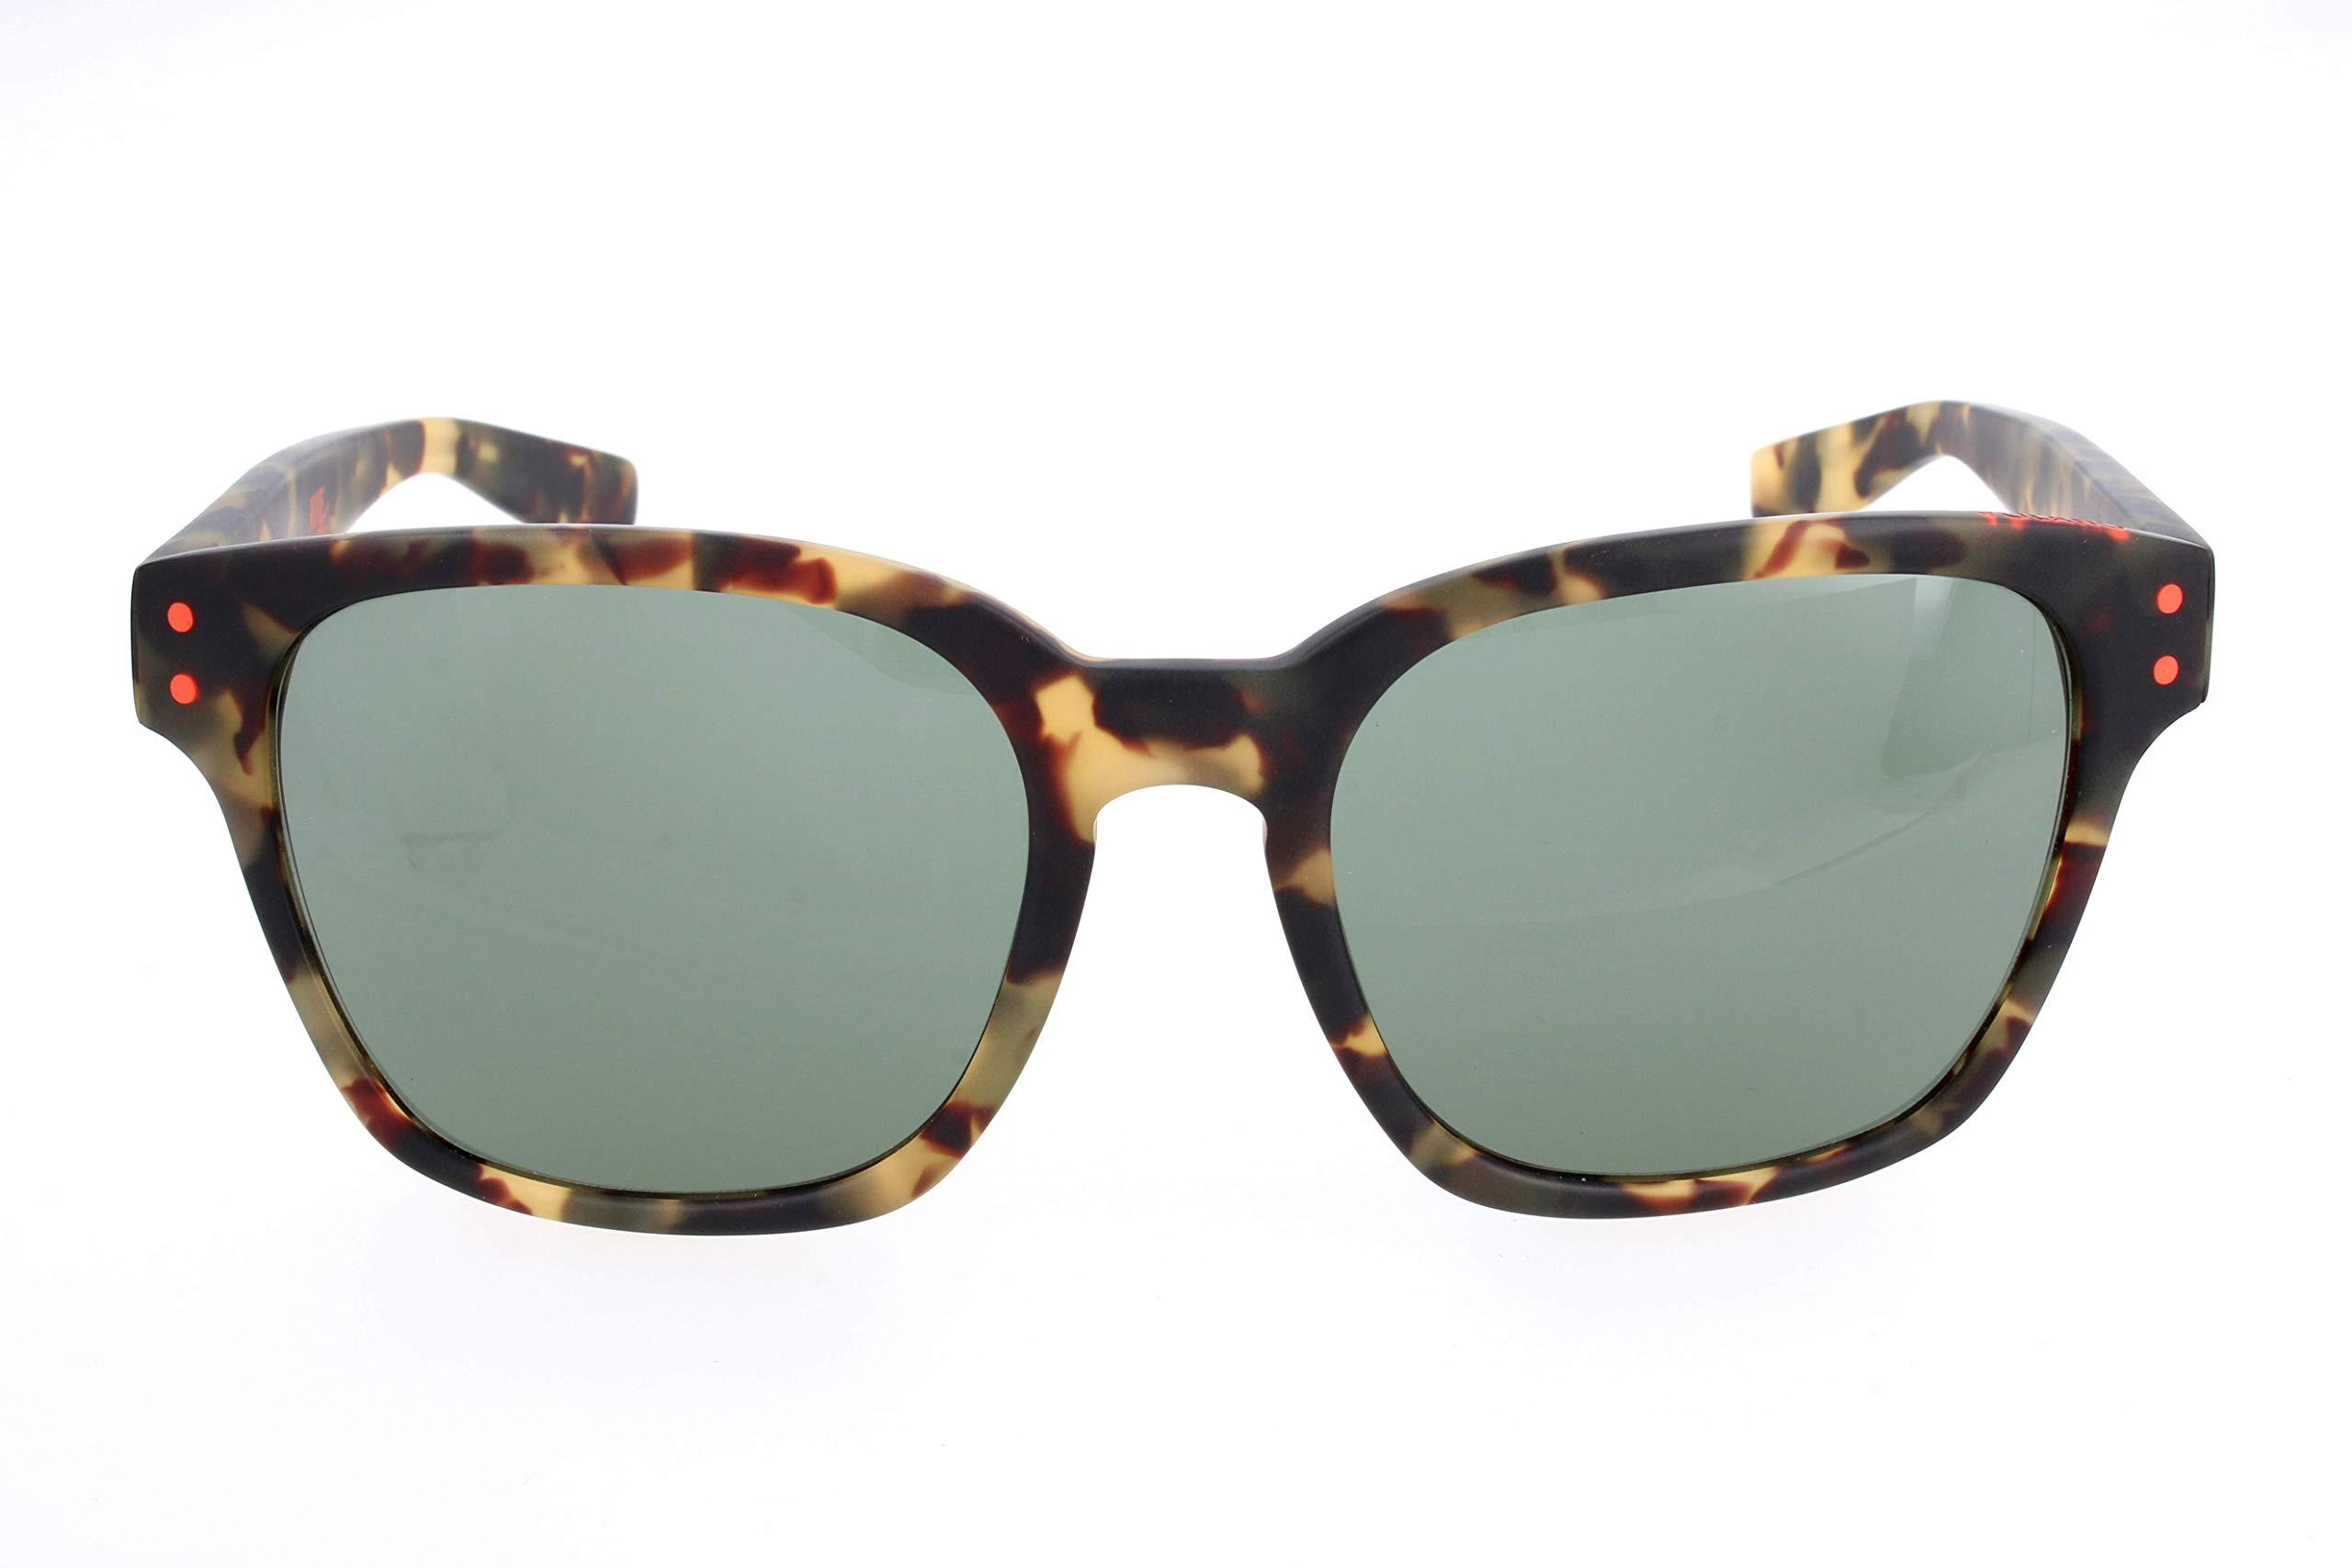 Nike EV0877-203 Volano Sunglasses (One Size), Matte Tokyo Tortoise/Hyper Jade, Teal Lens by Nike (Image #3)